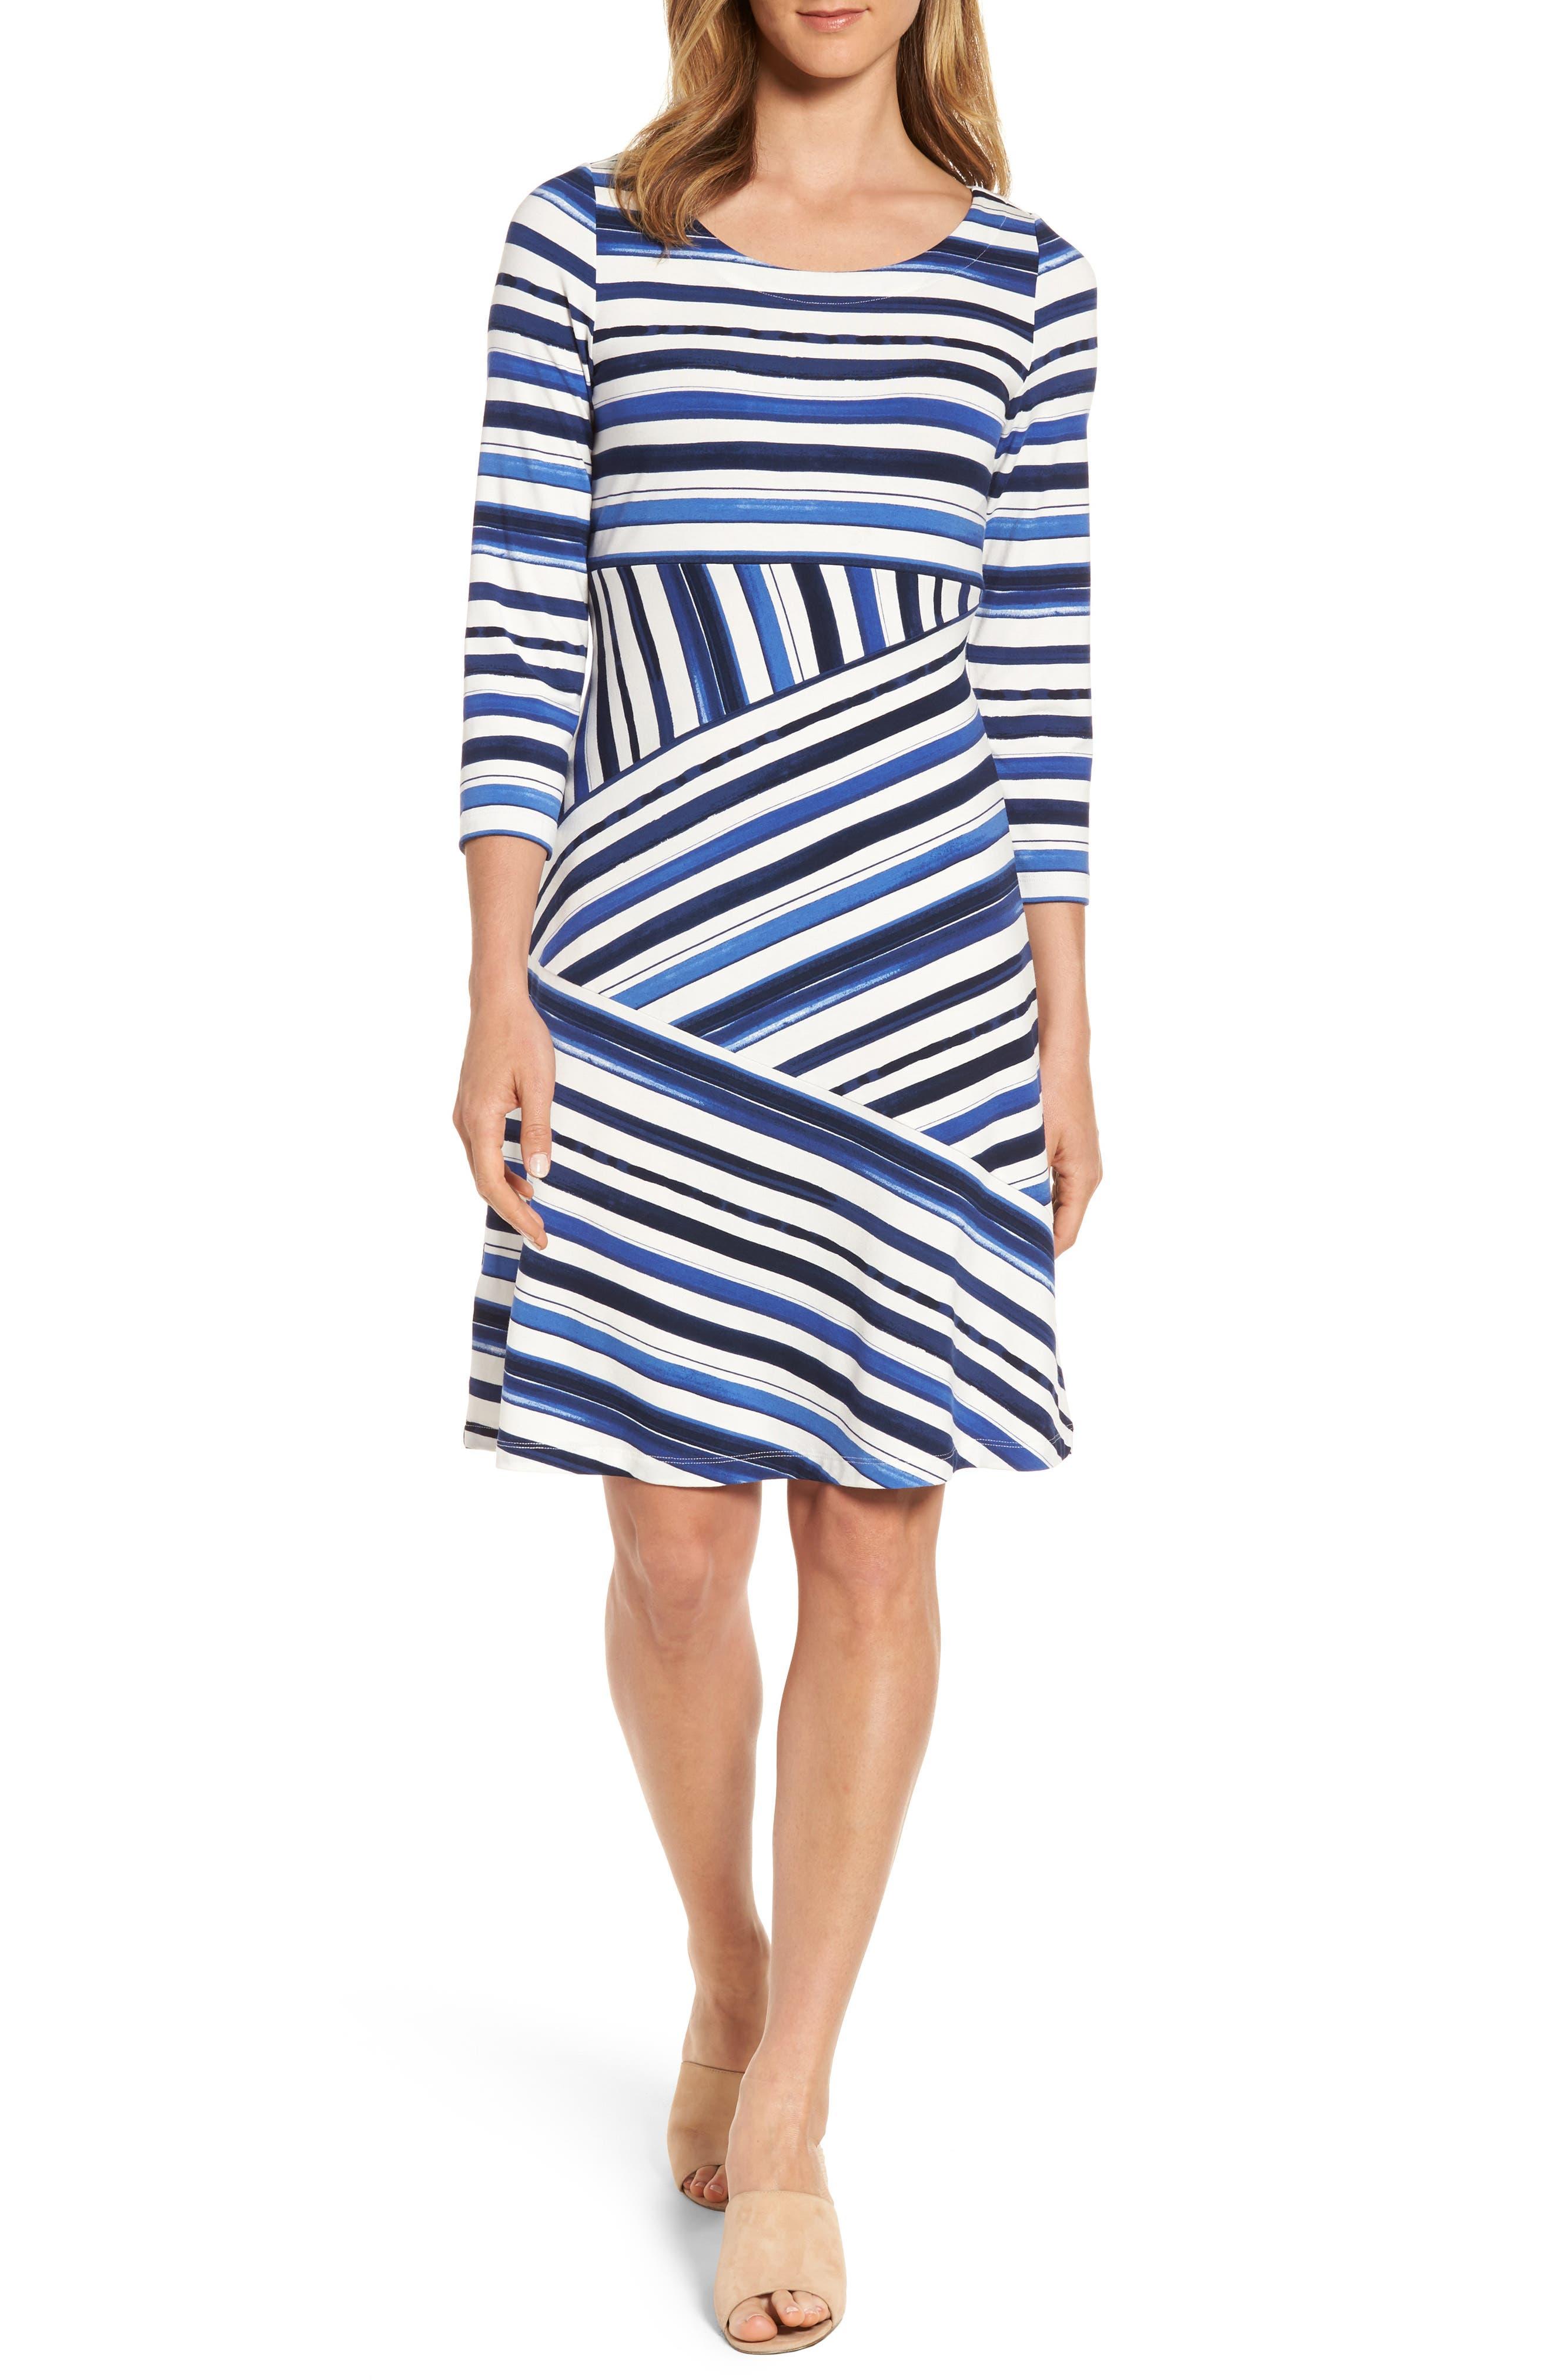 Alternate Image 1 Selected - Tommy Bahama Aquarelle Stripe A-Line Dress